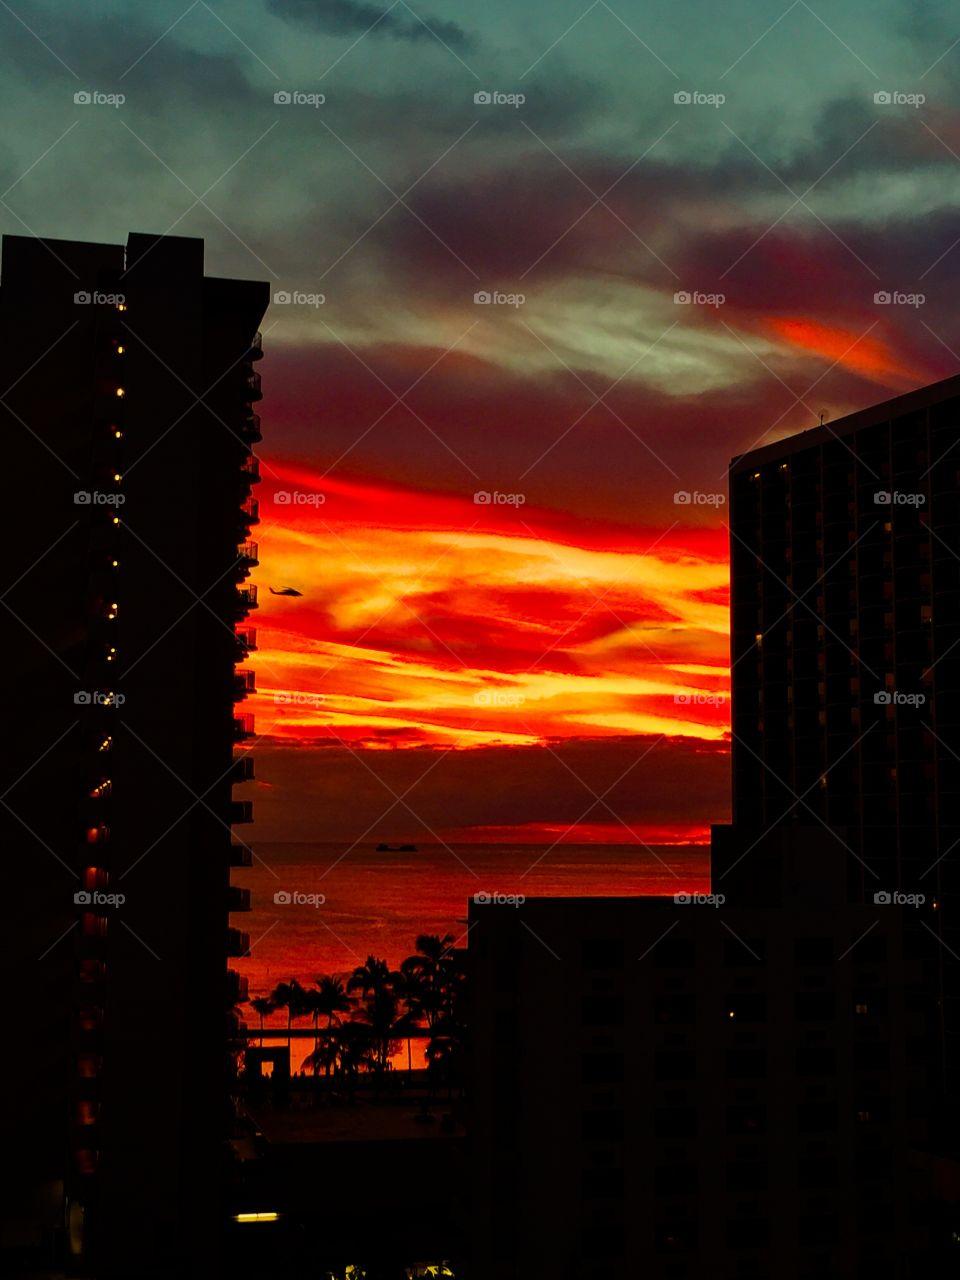 Sunsets and sailboats